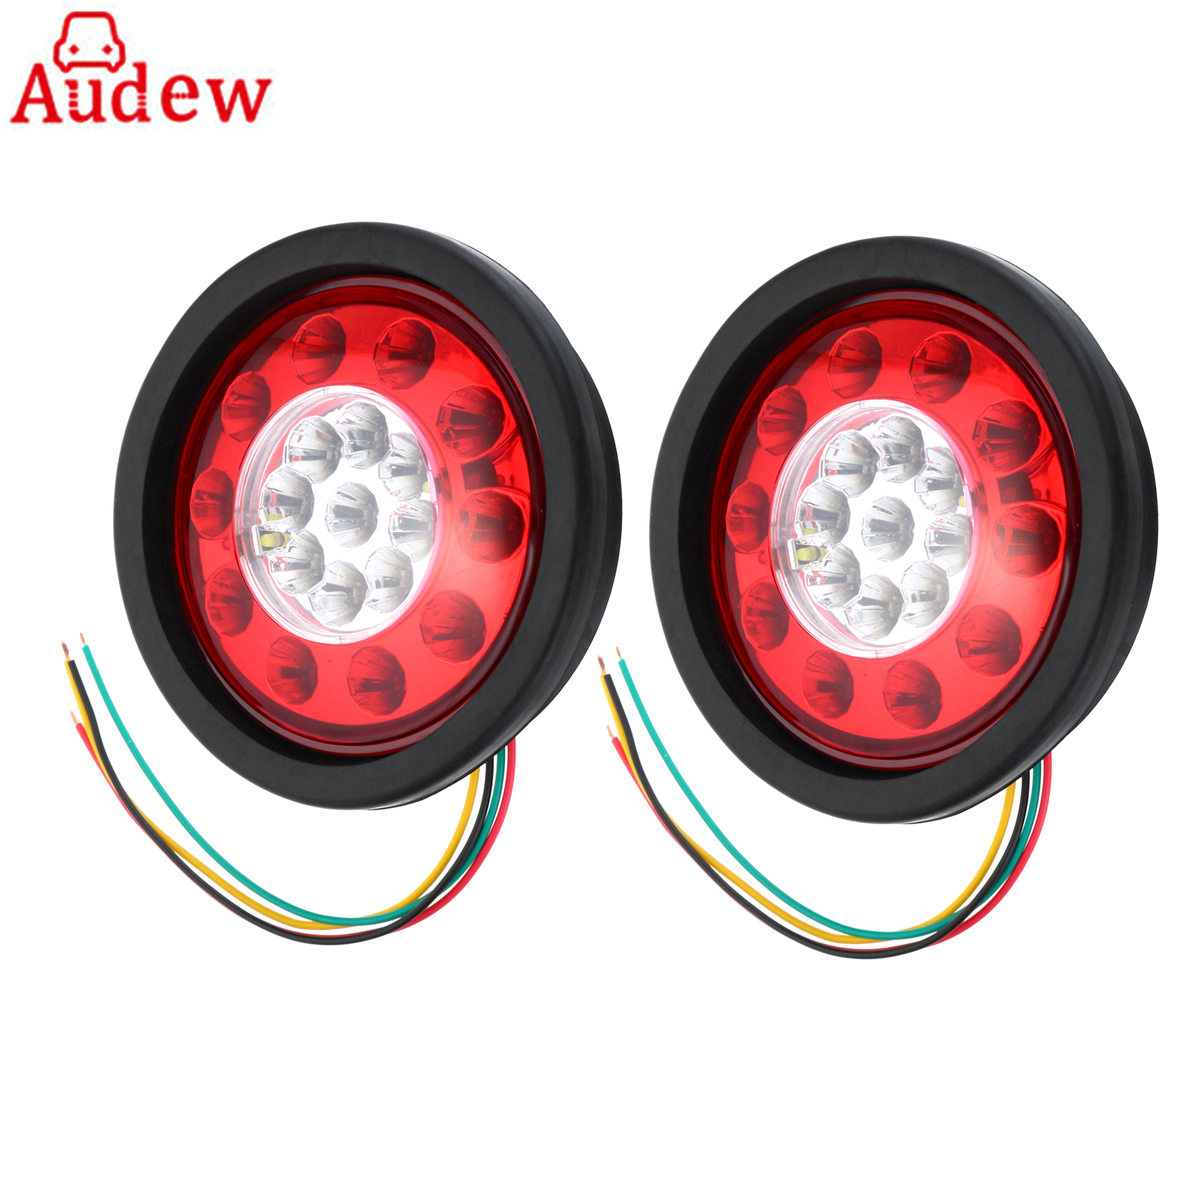 Aliexpress.com : Buy 2Pcs 12V/24V Round Yellow Red 19 LED